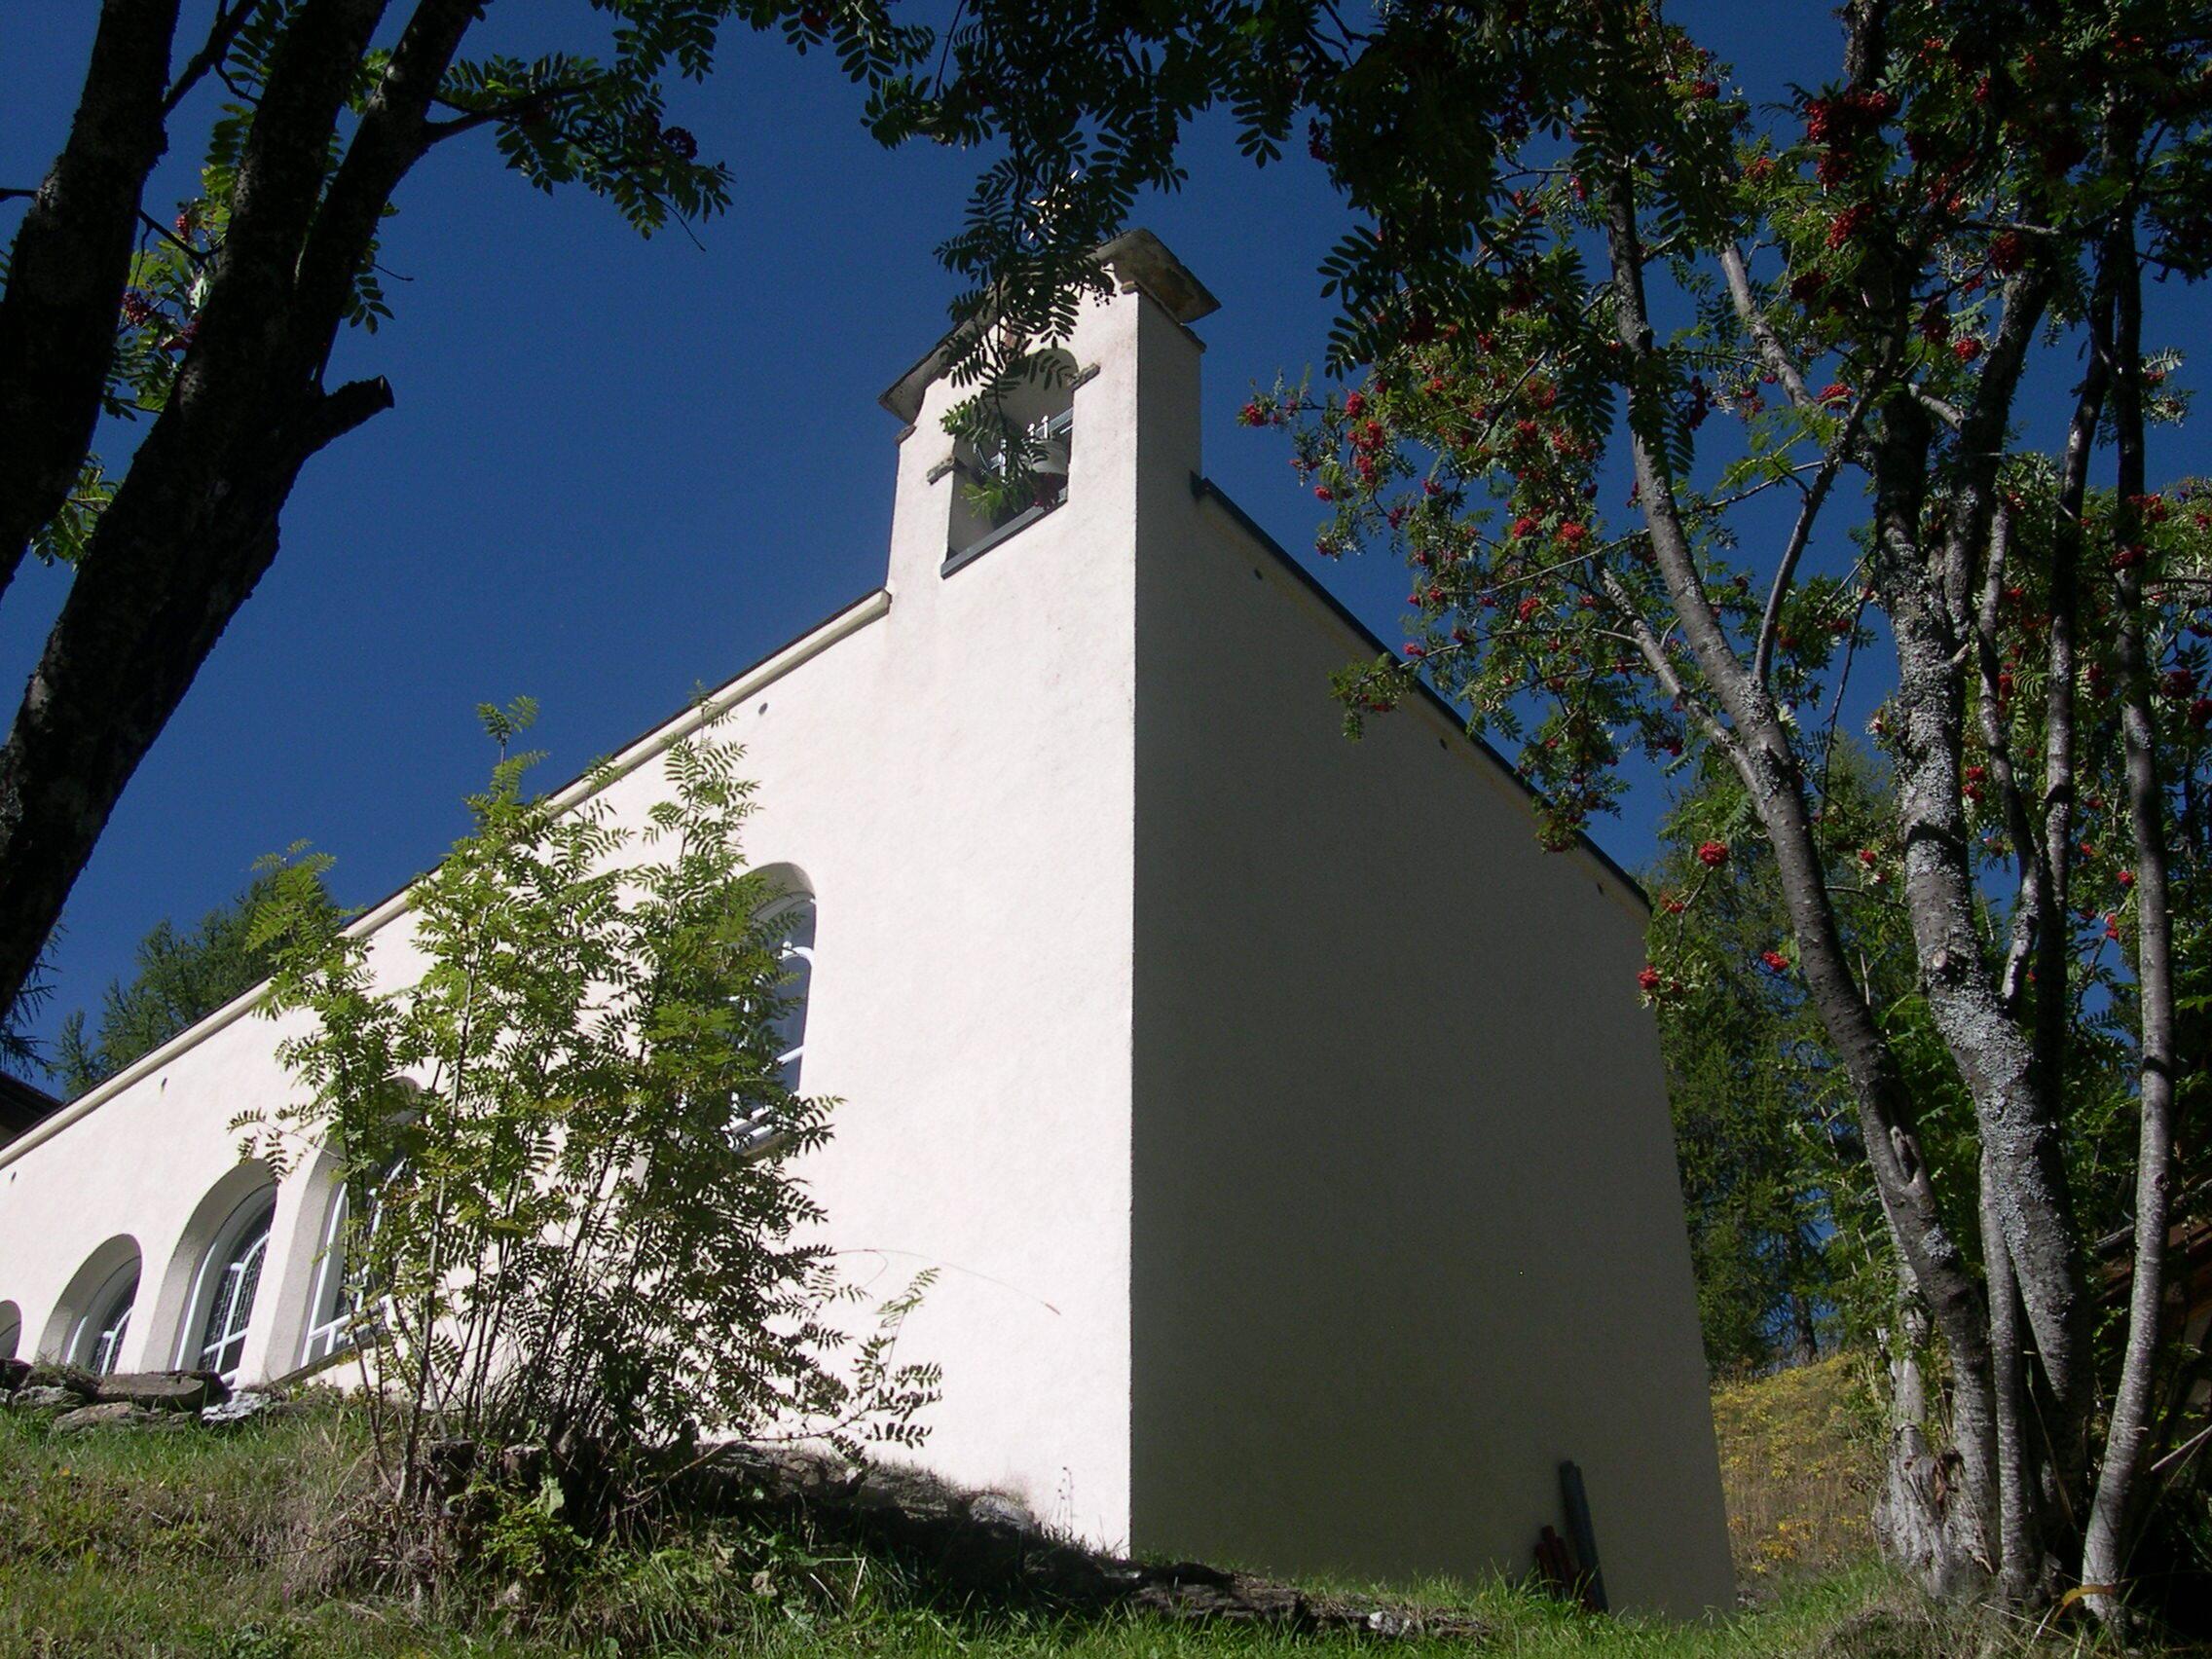 Katholische Kirche Christkönig Slide 2